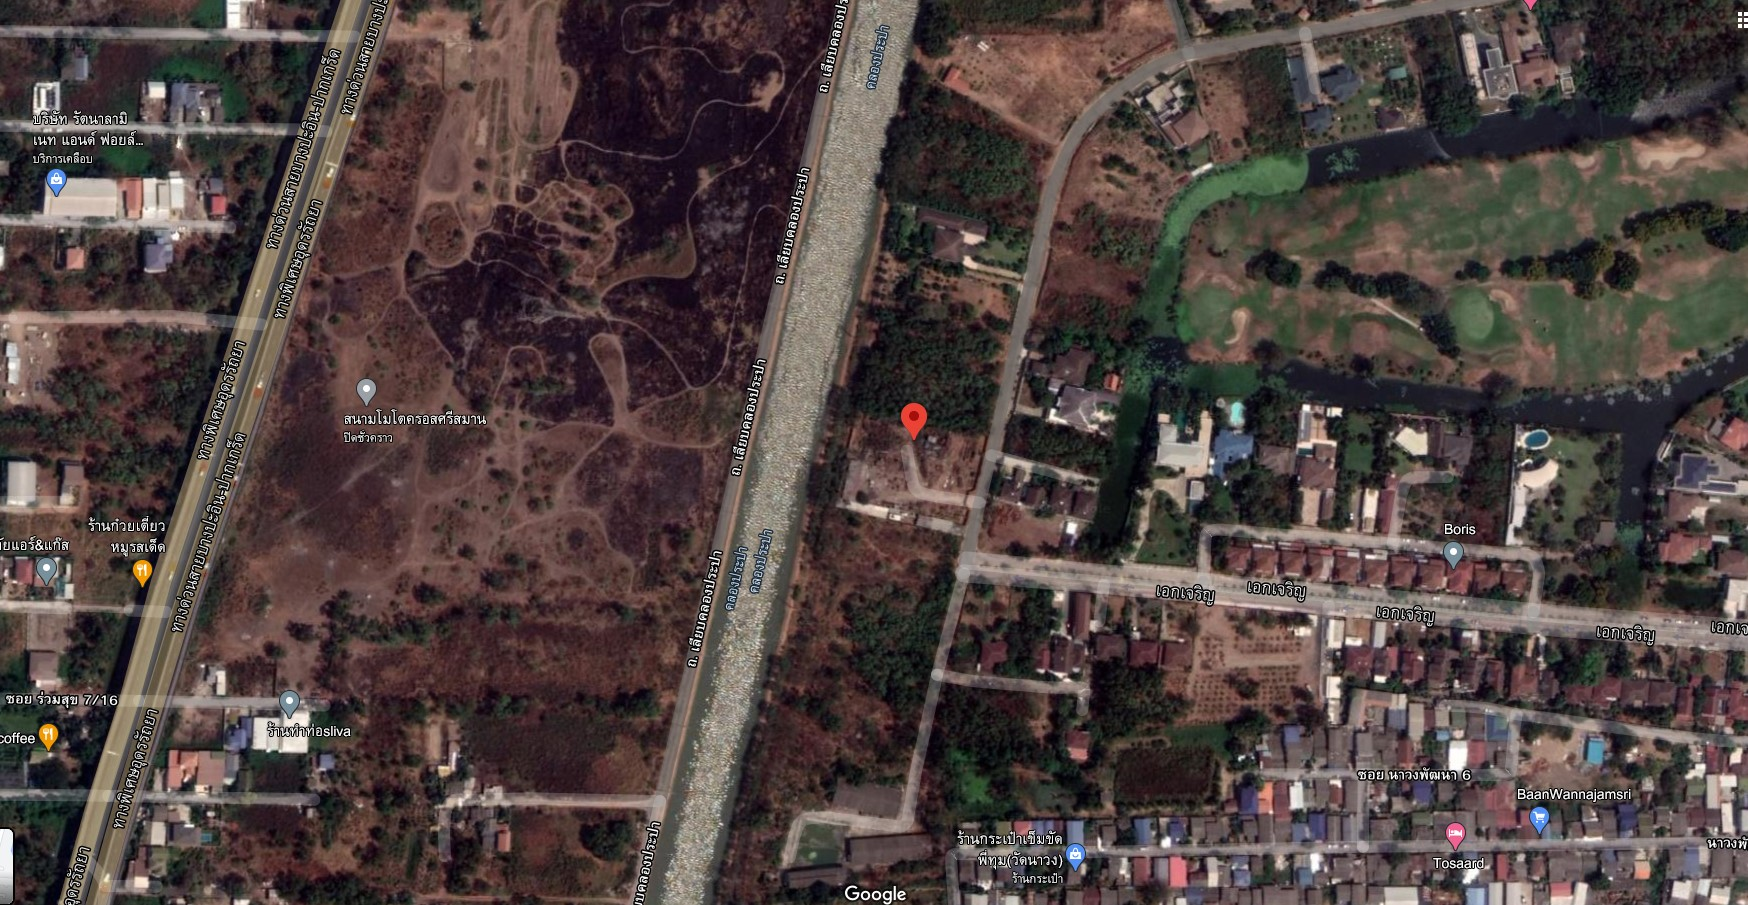 V&C L#00205-ที่ดินเปล่า เมืองเอก 1-1-52 ไร่ ถ.เอกเจริญ  ต.หลักหก อ.เมือง จ.ปทุมธานี